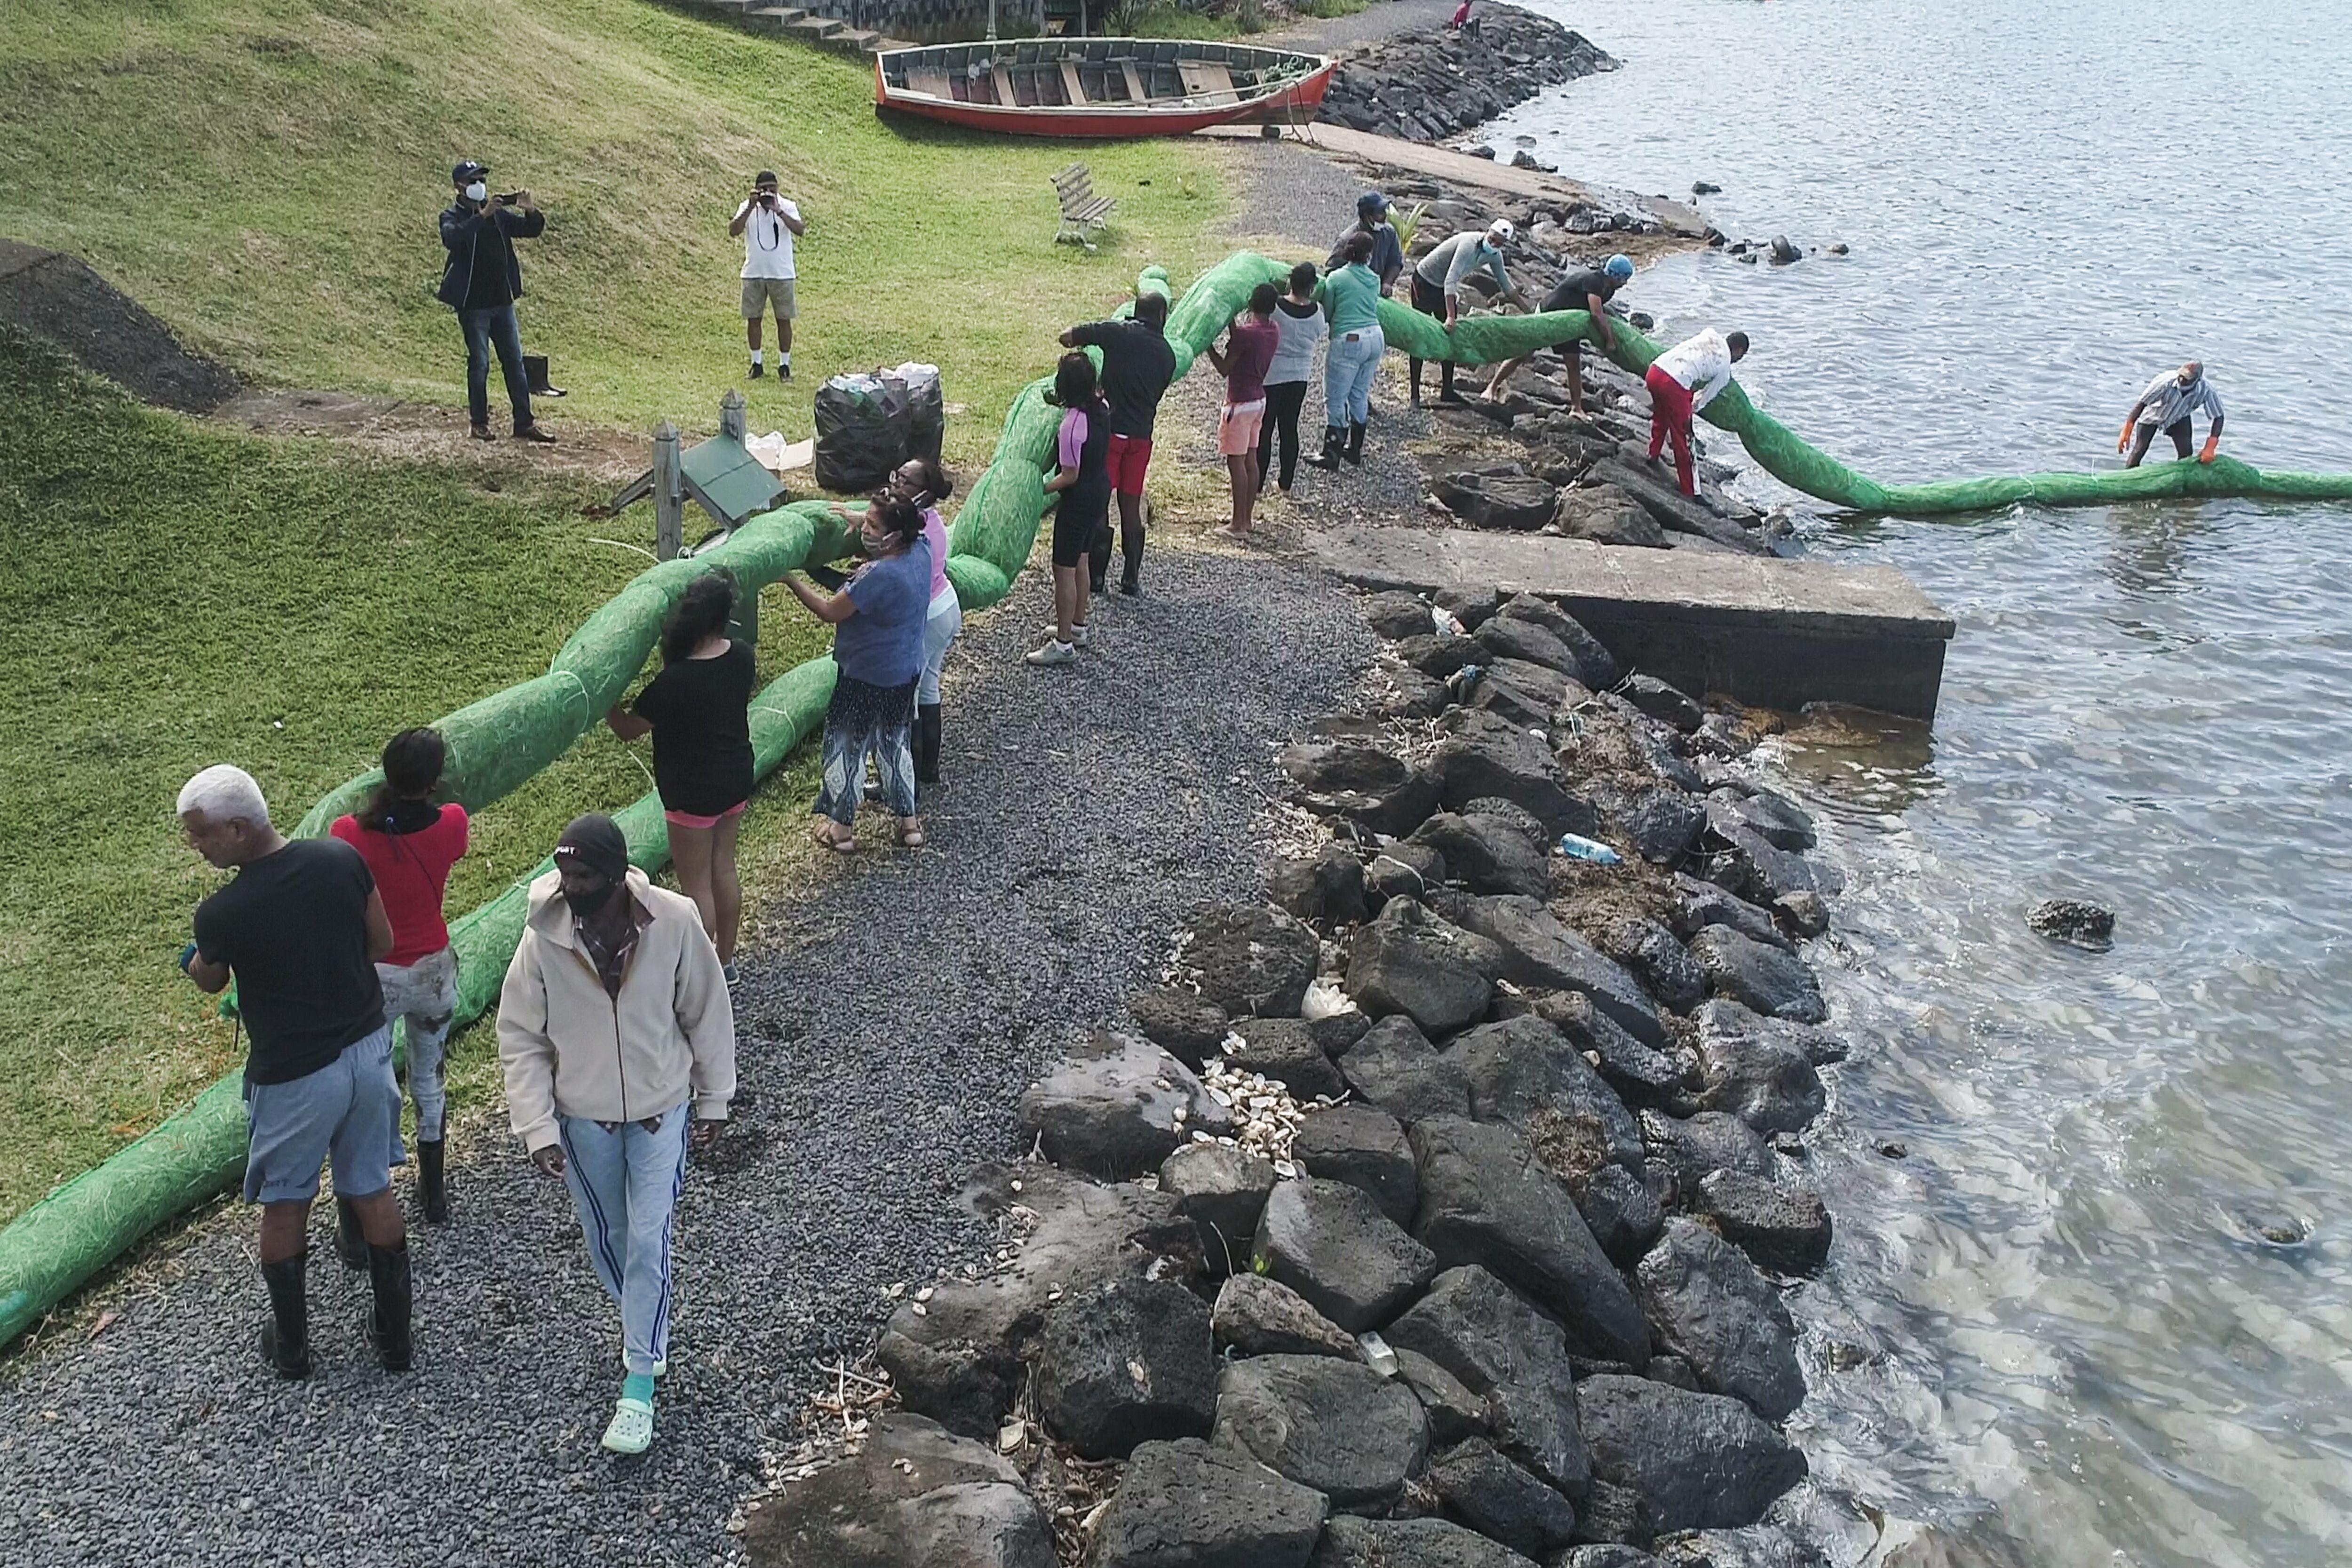 Volunteers carry the handmade oil barrier to block leaked oil from the MV Wakashio bulk carrier.